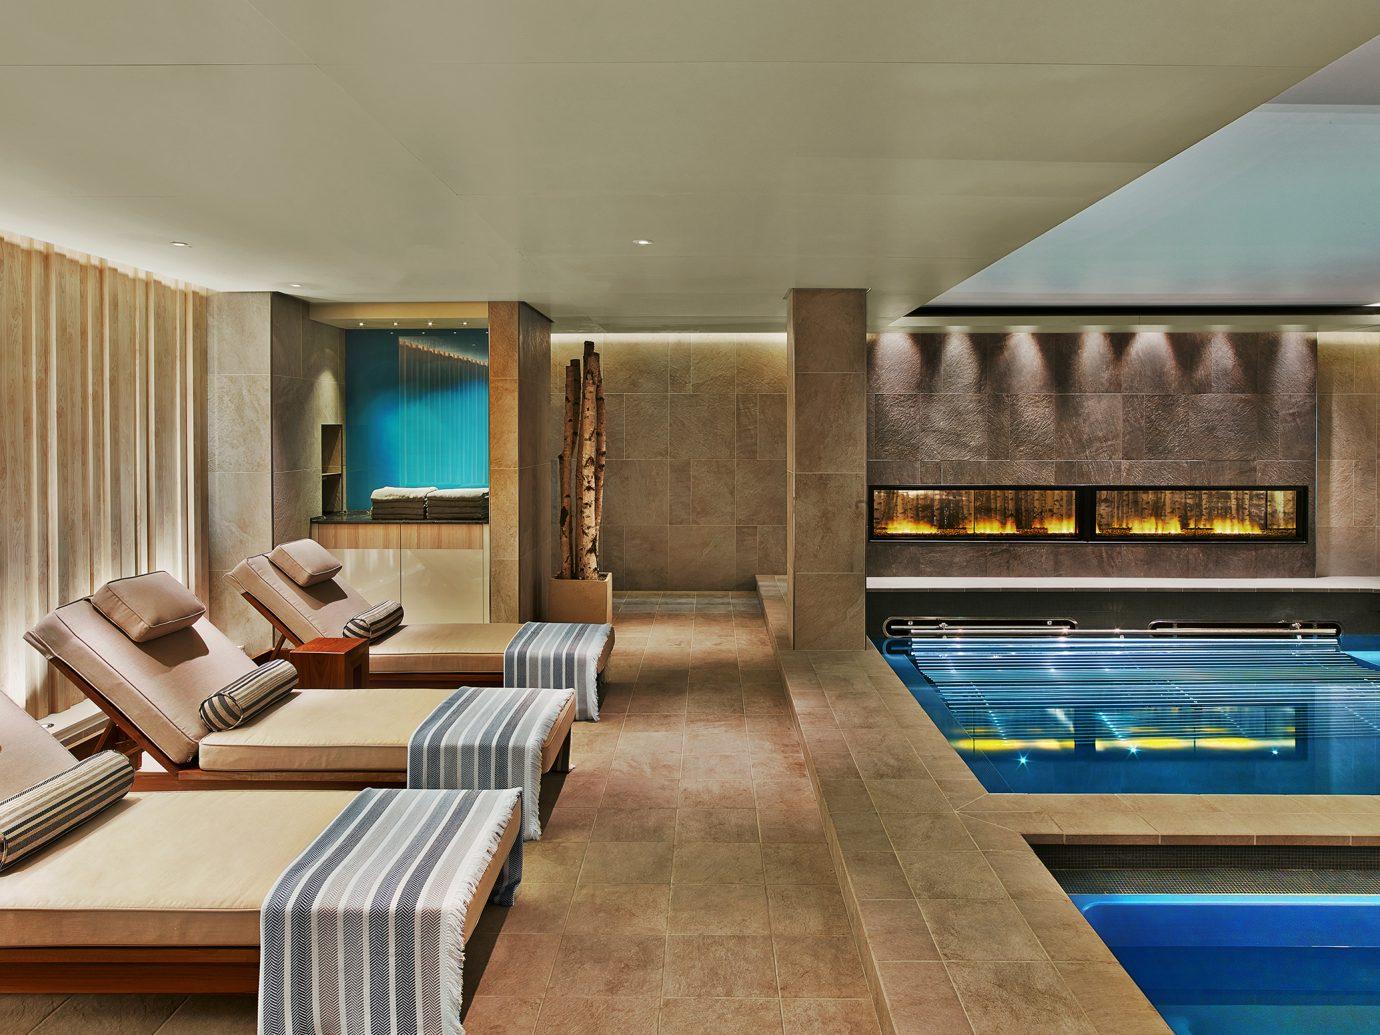 Lounge chairs and heated salt pools inside the Viking Sea Spa